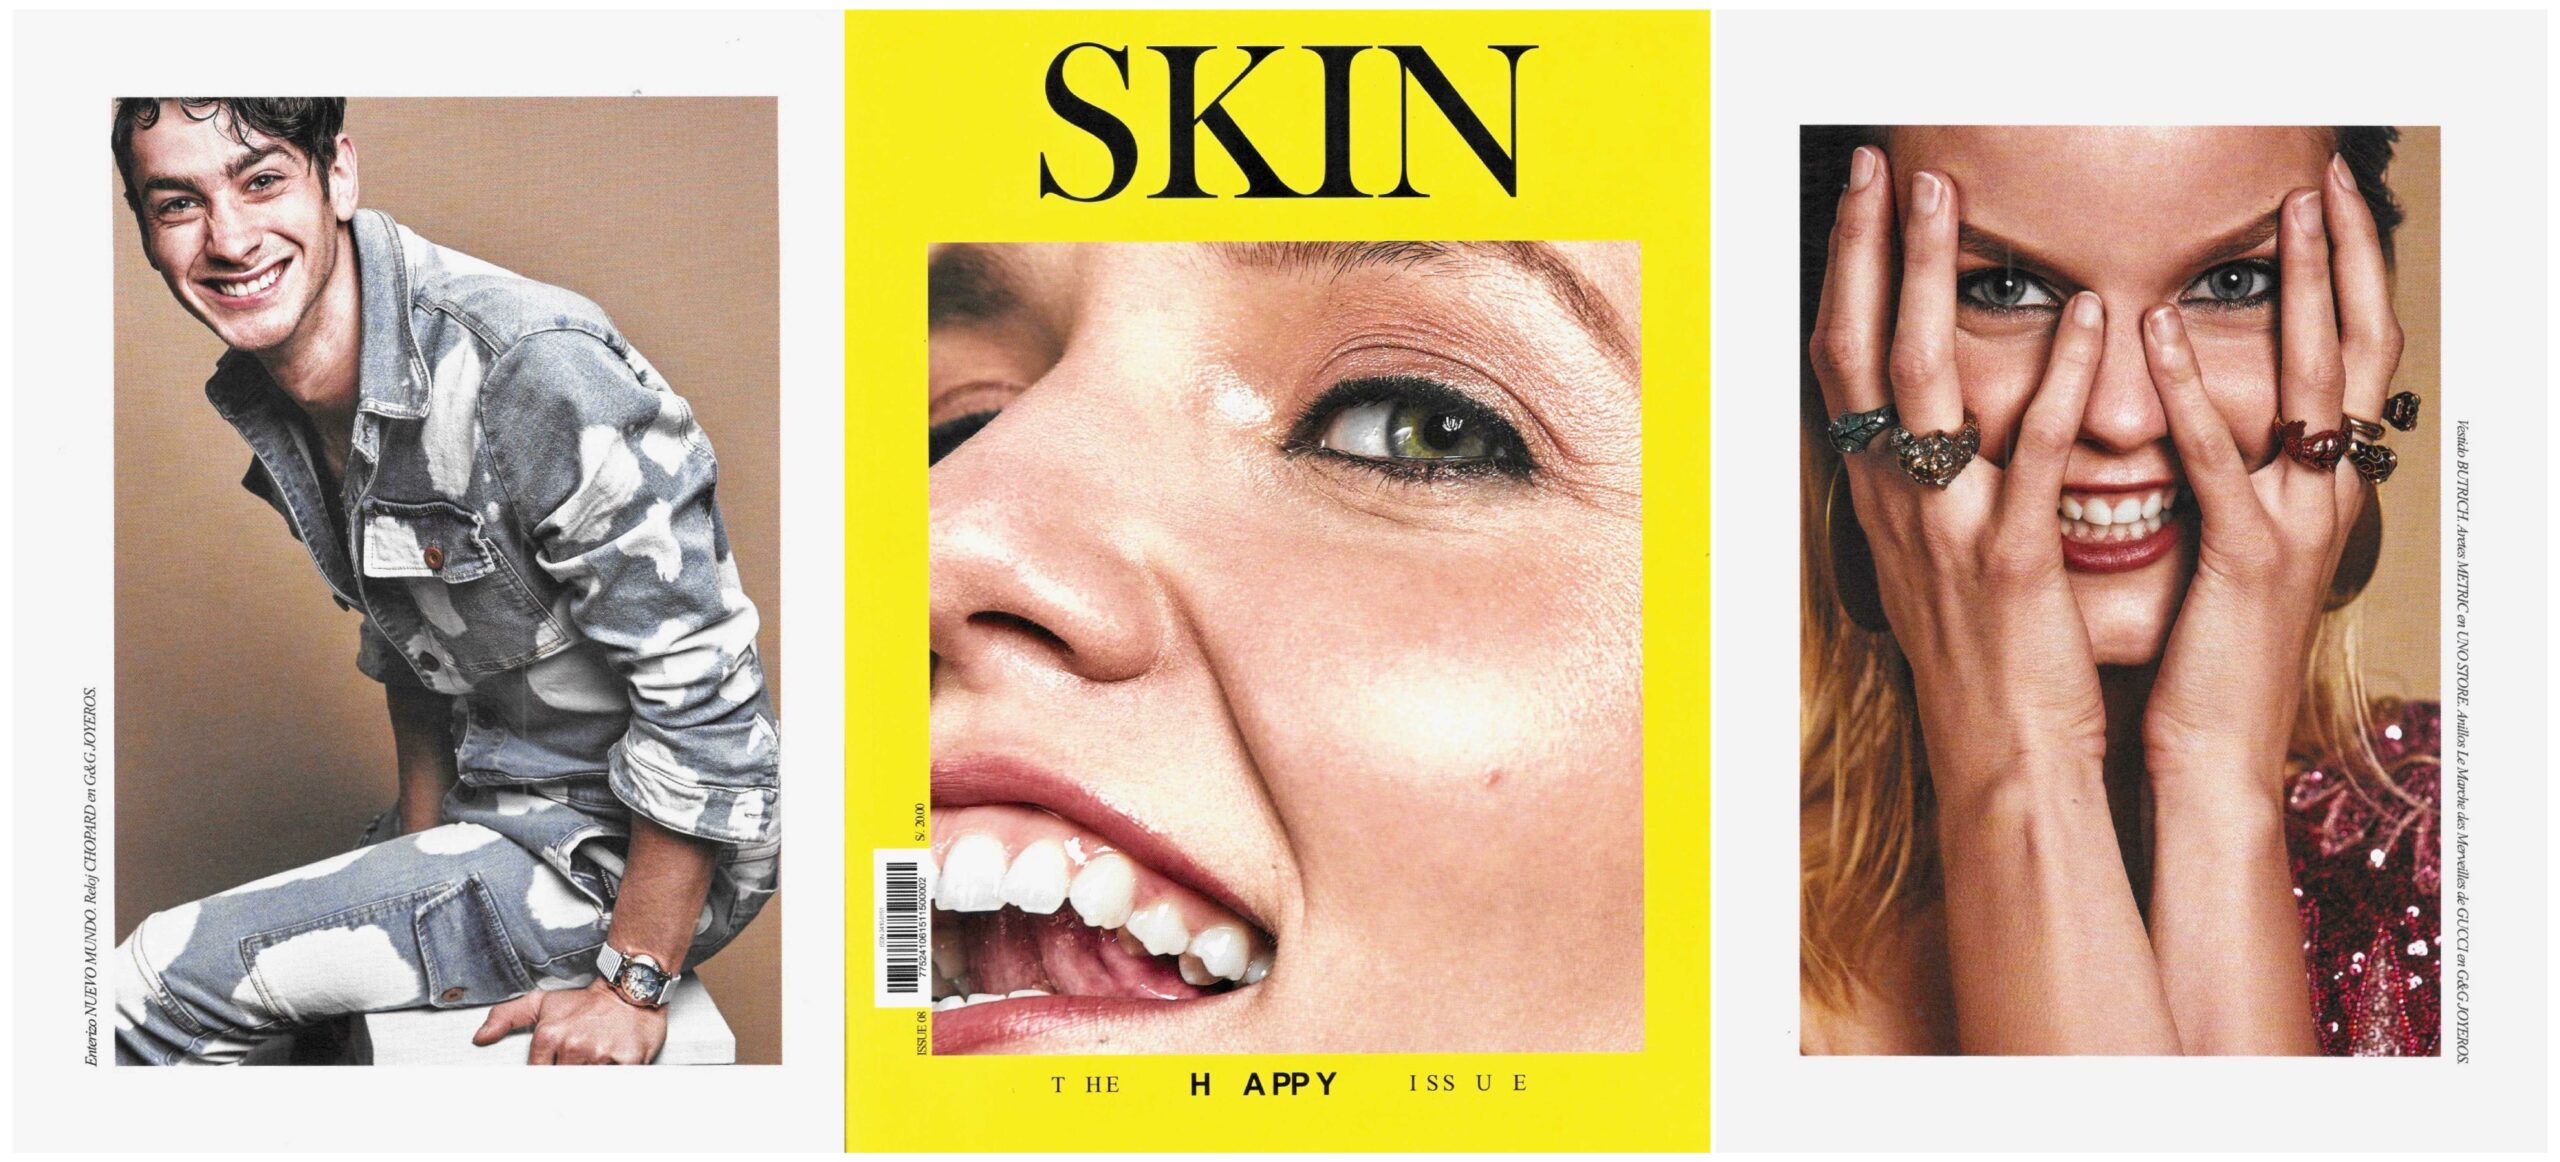 skin magazine